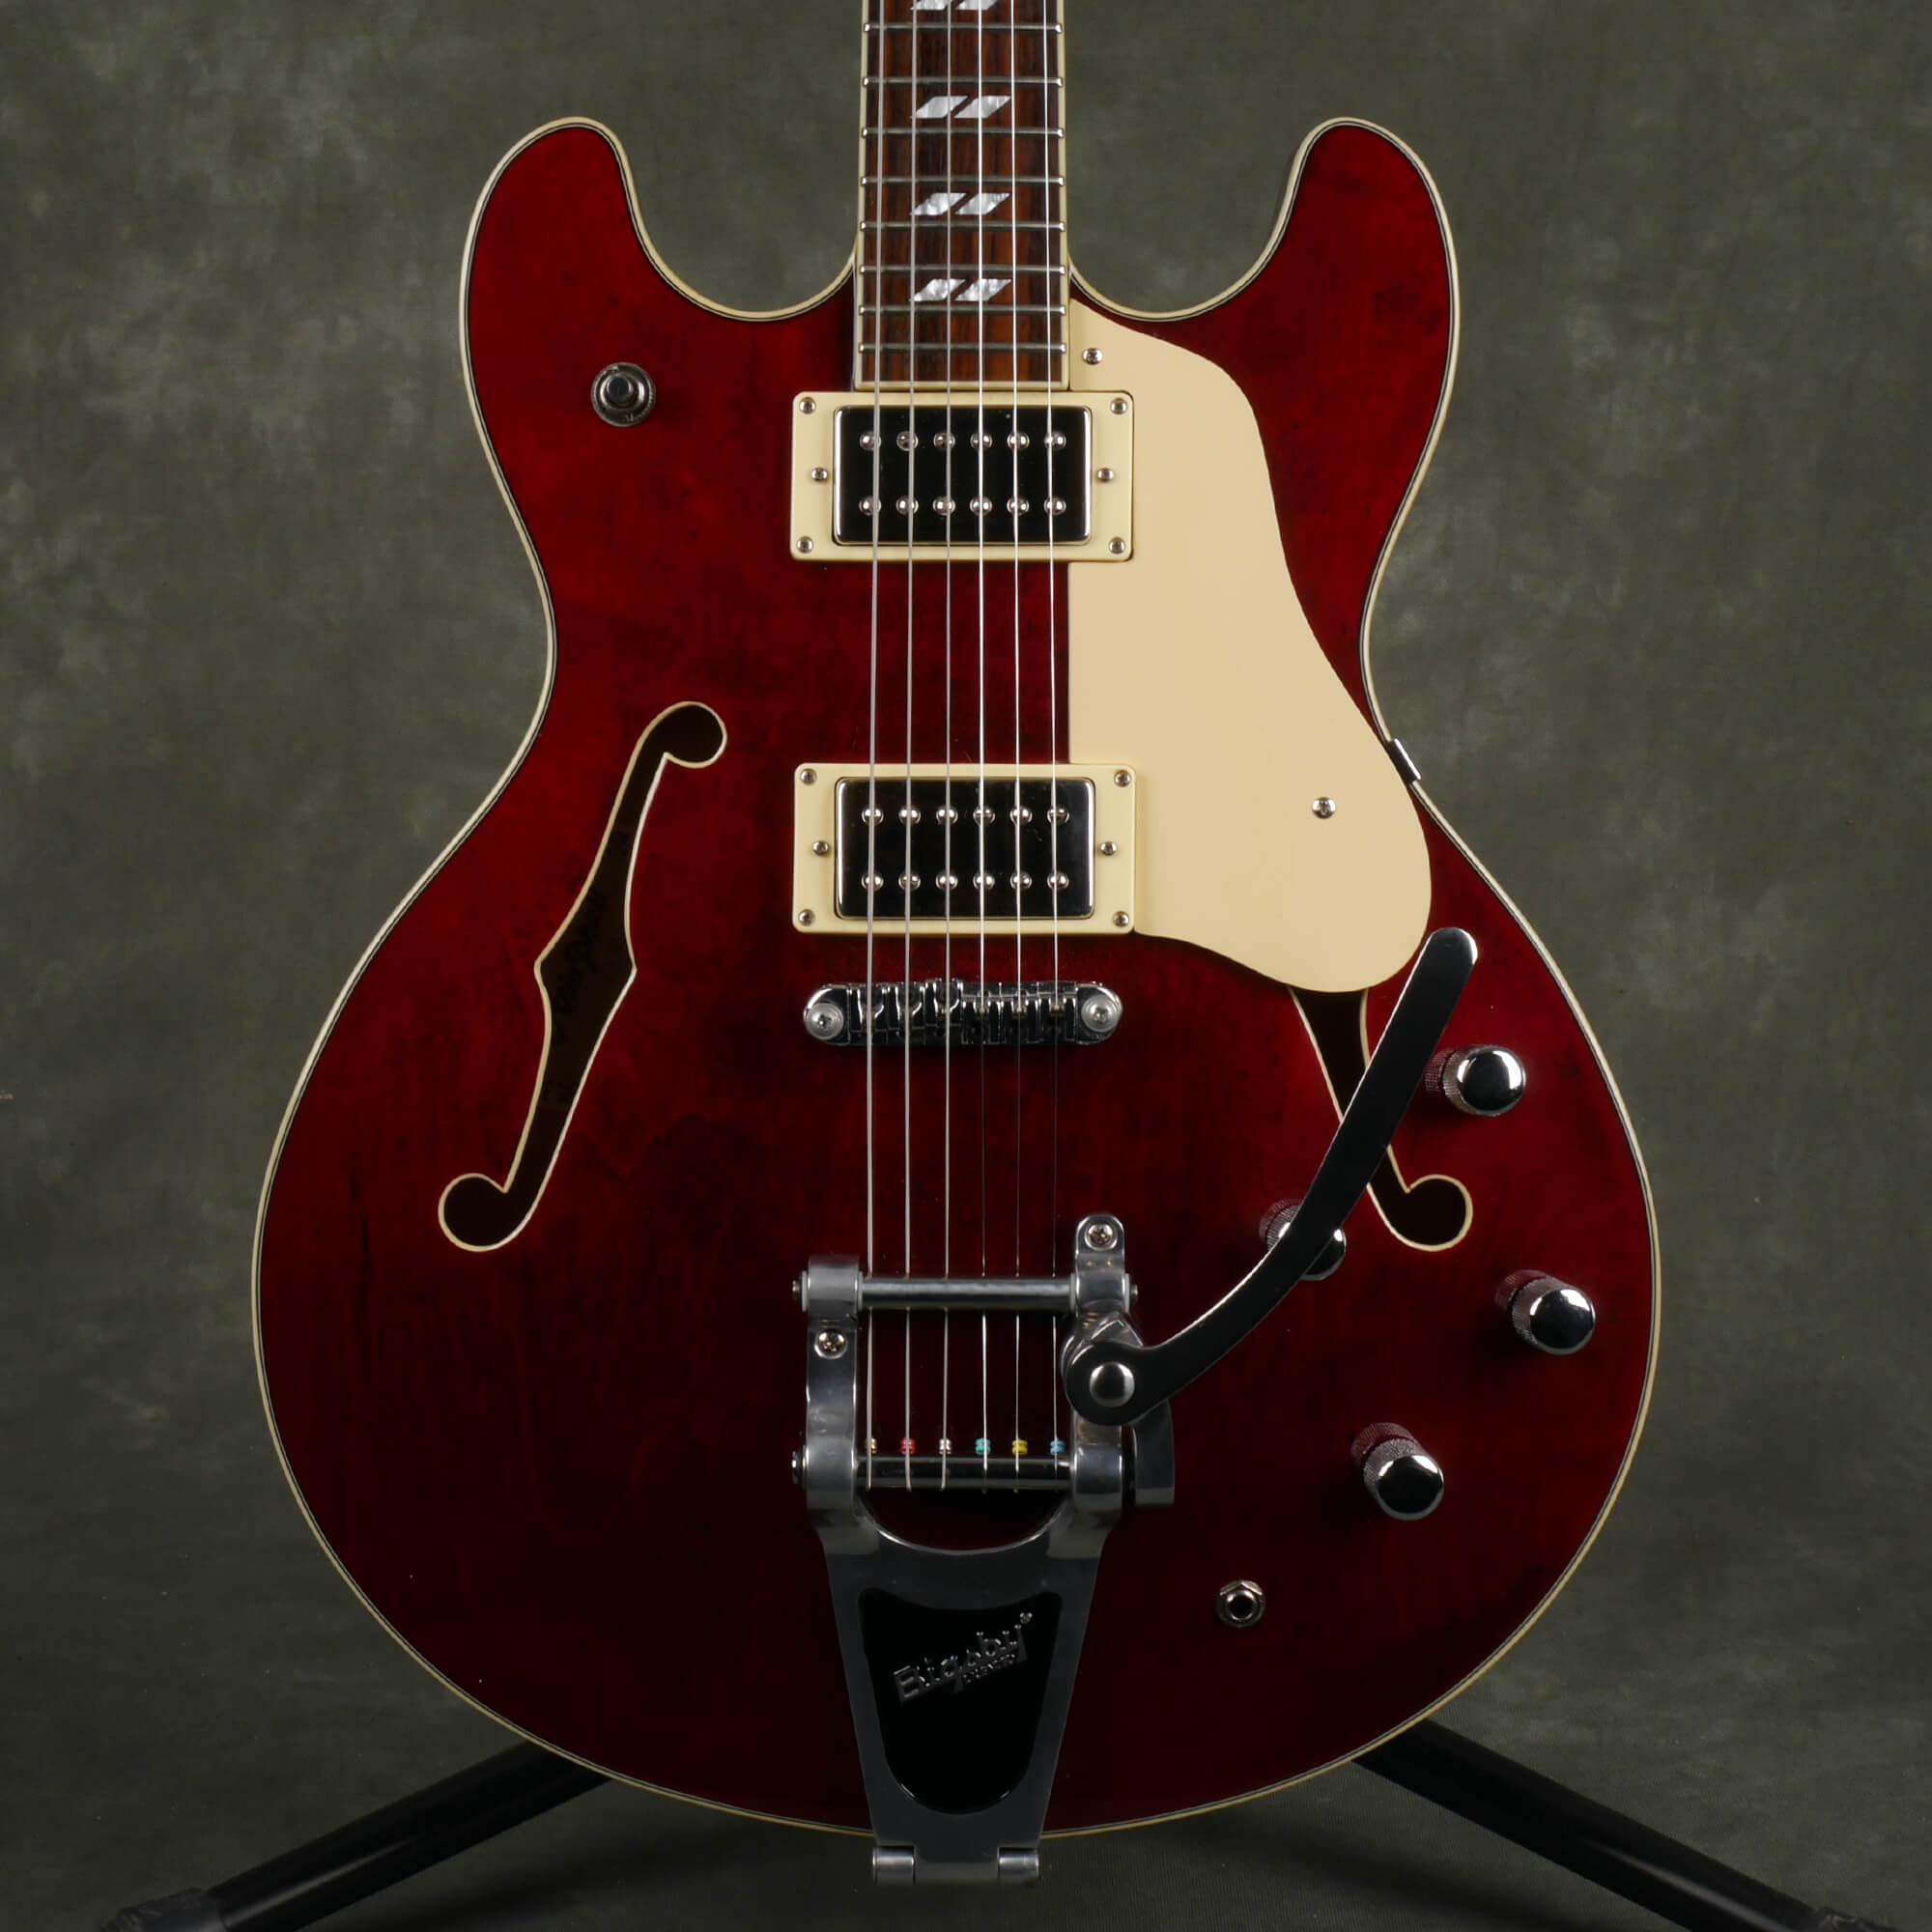 Aria Pro II TA-80 Semi-Hollow Electric Guitar - Wine Red - 2nd Hand